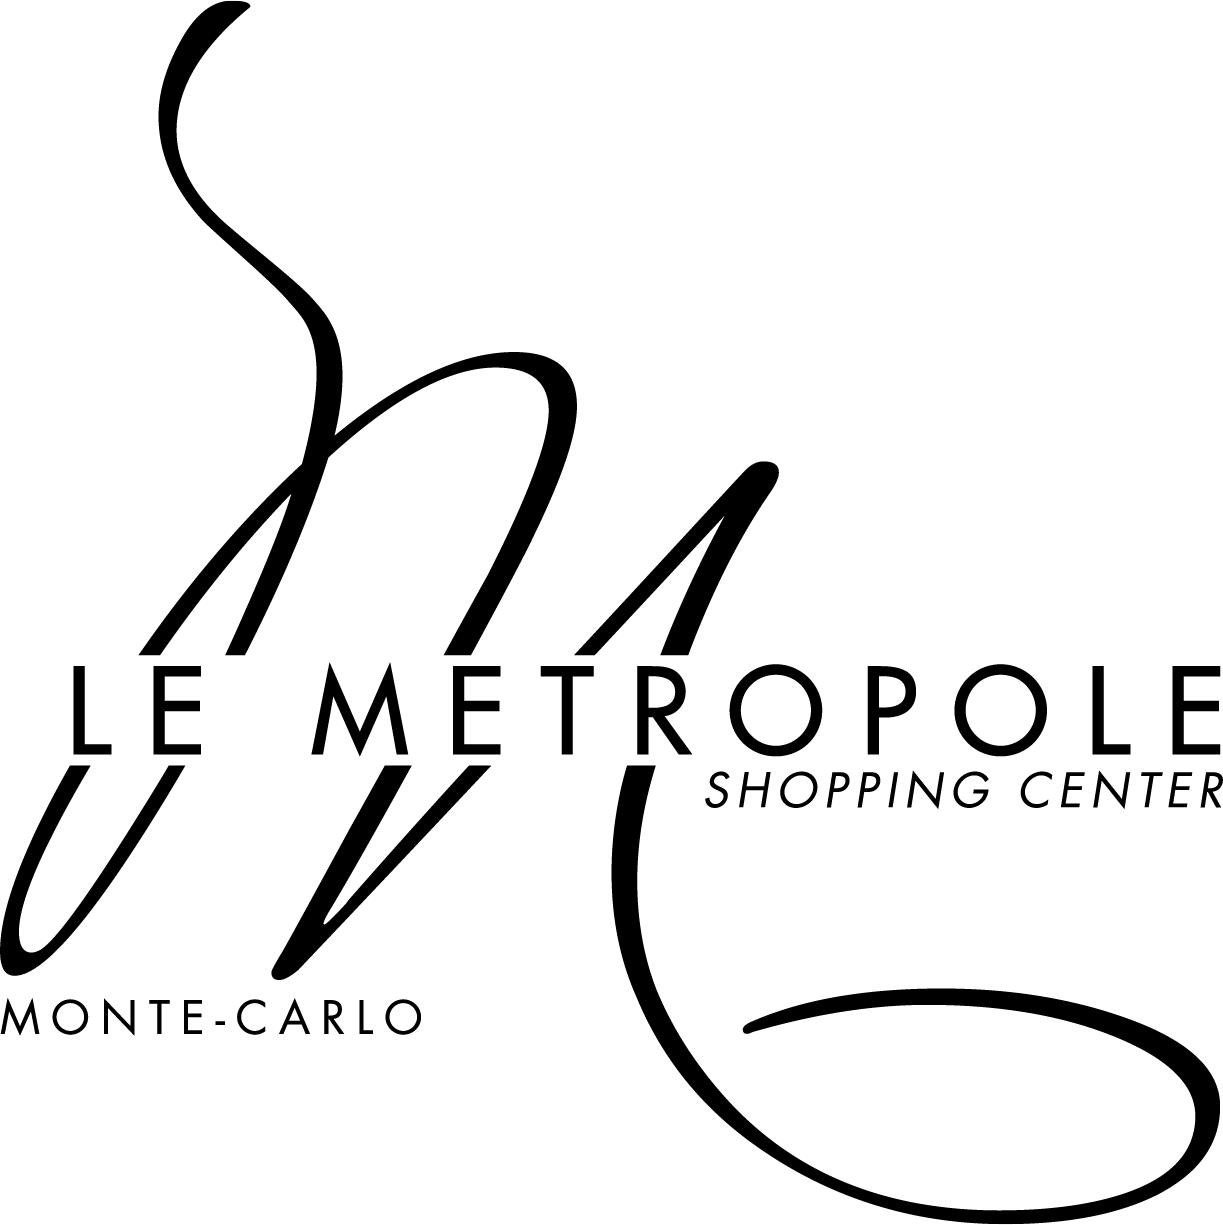 Métropole Shopping Centrer